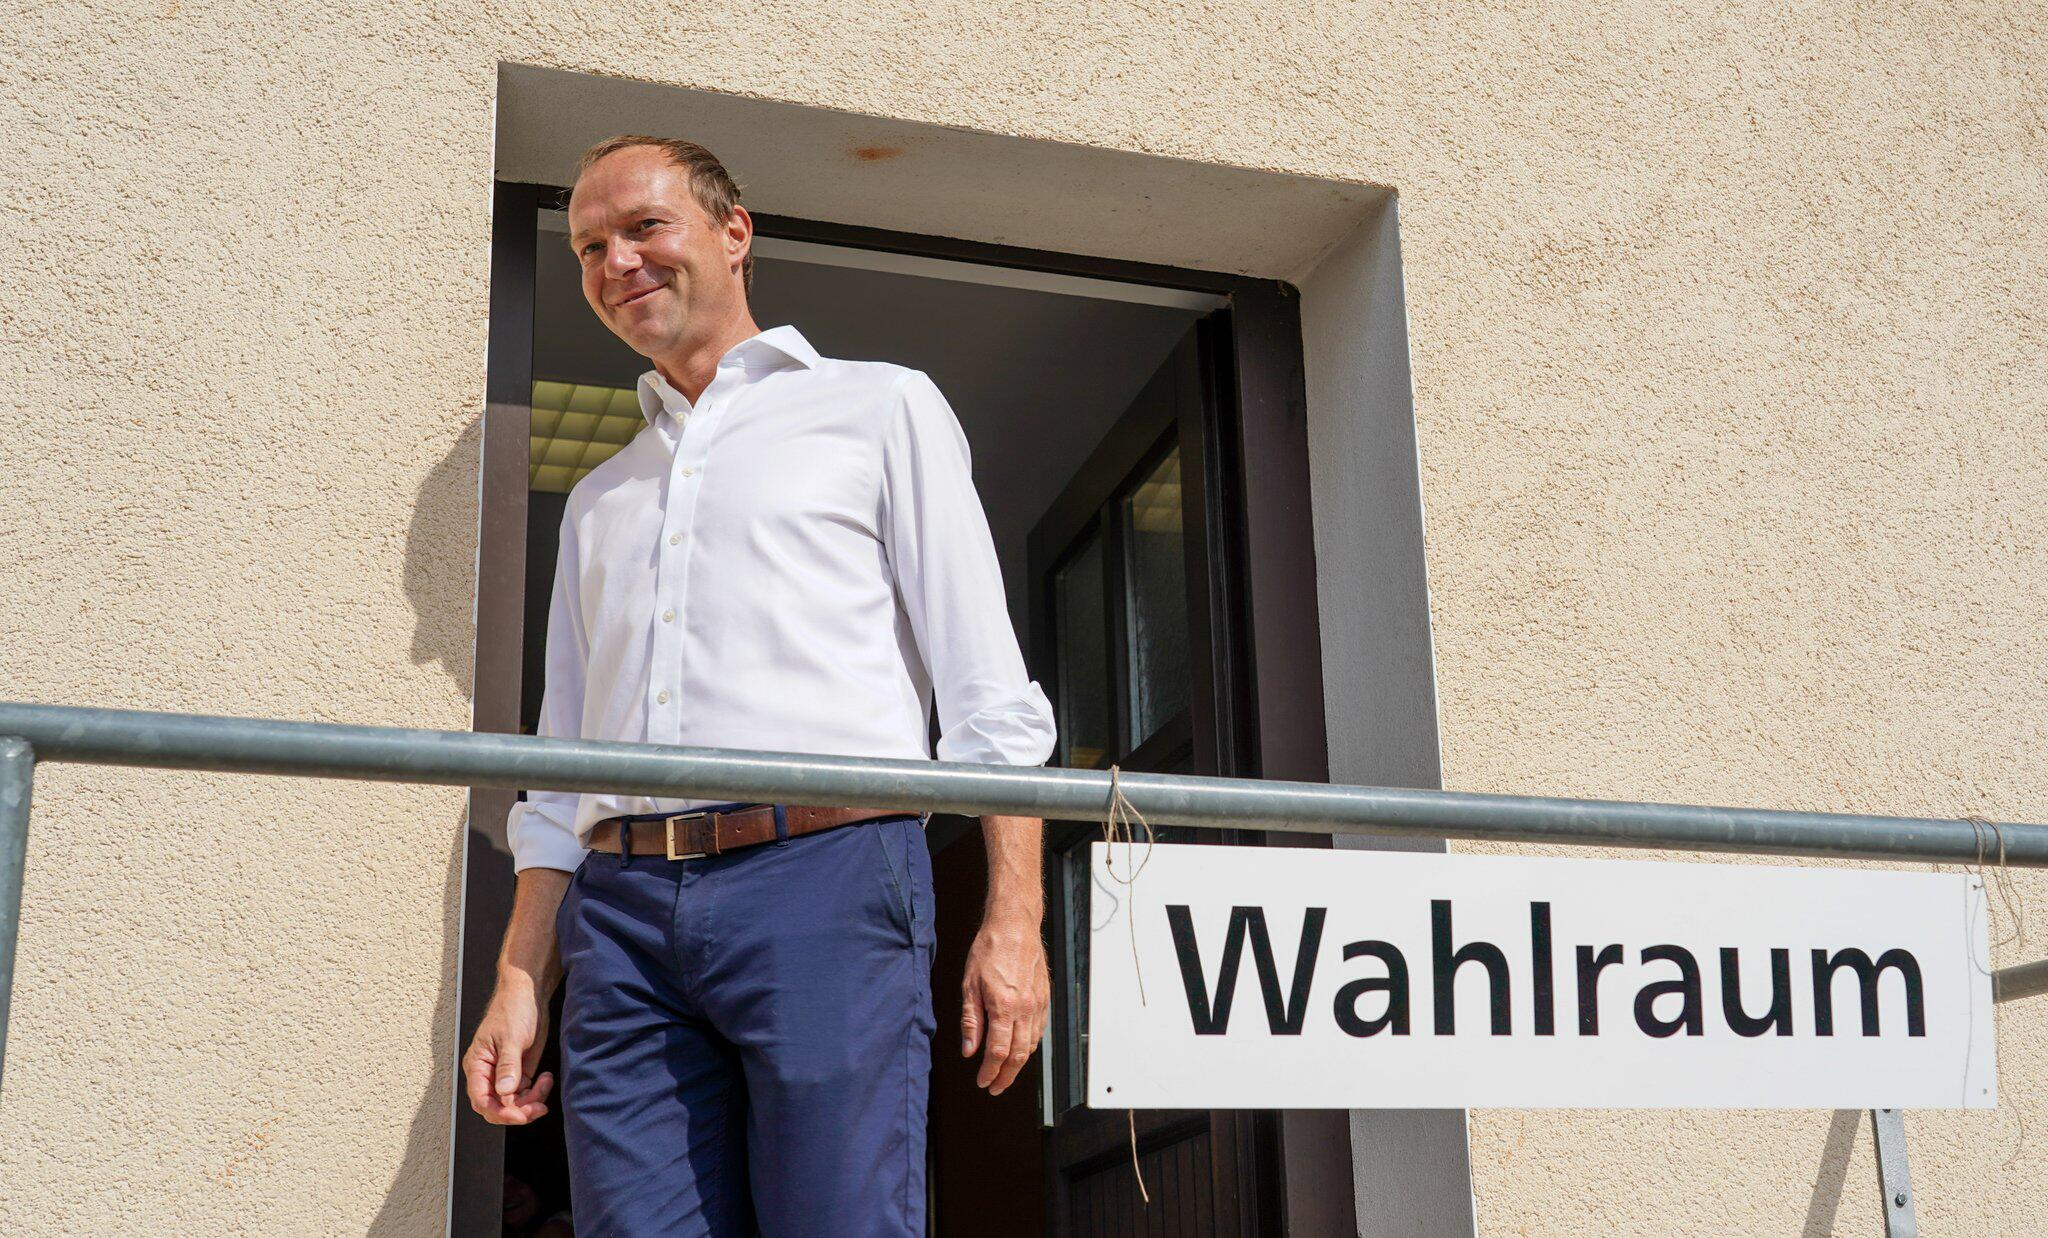 Bild zu Landtagswahl Sachsen - Stimmabgabe Bündnis90/Grüne